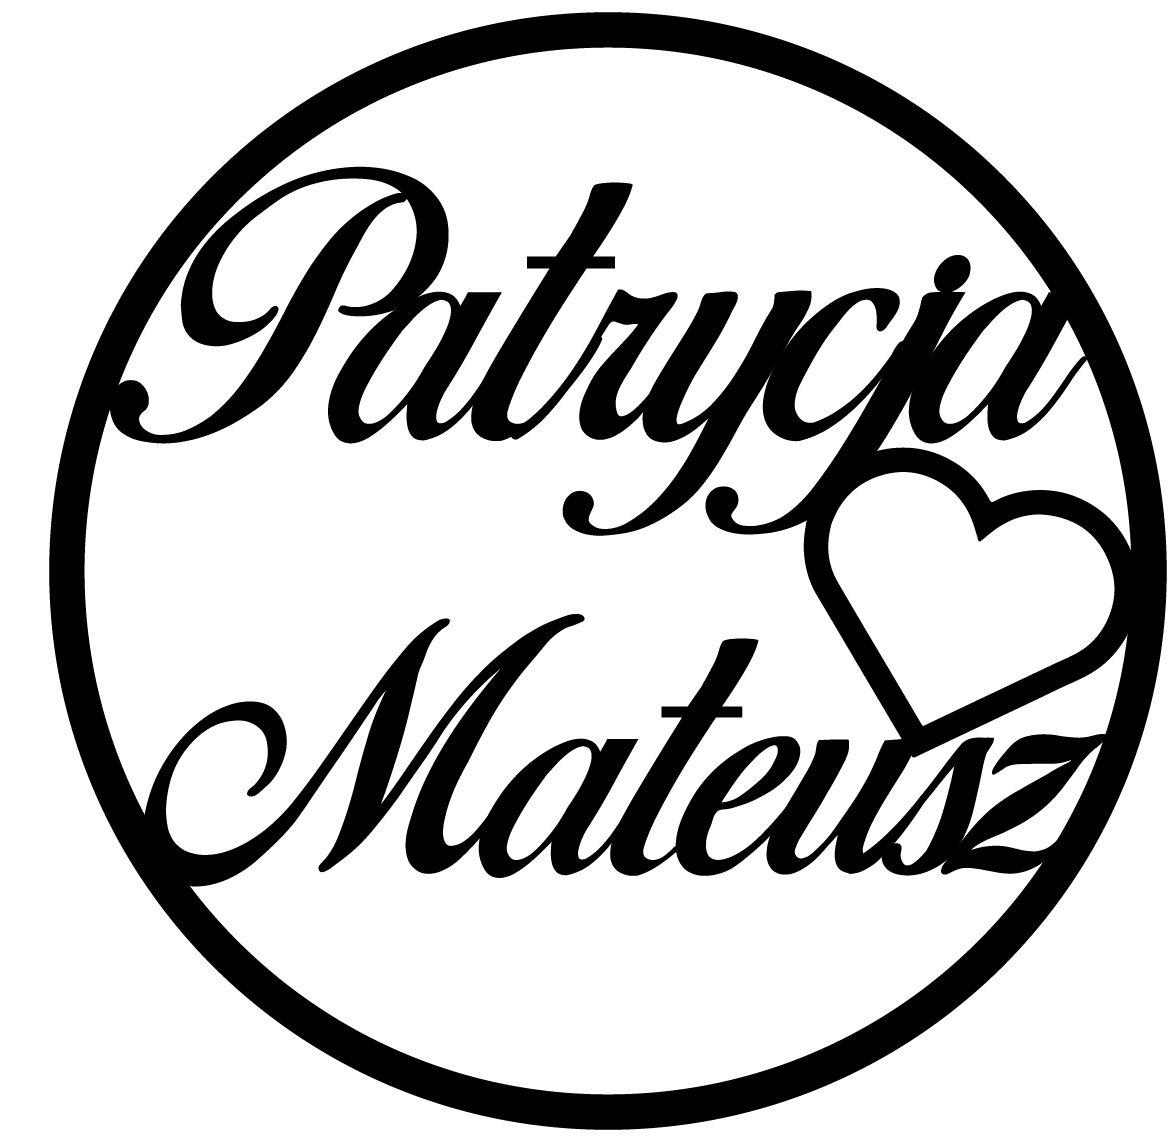 PatrycjaMateusz1a2